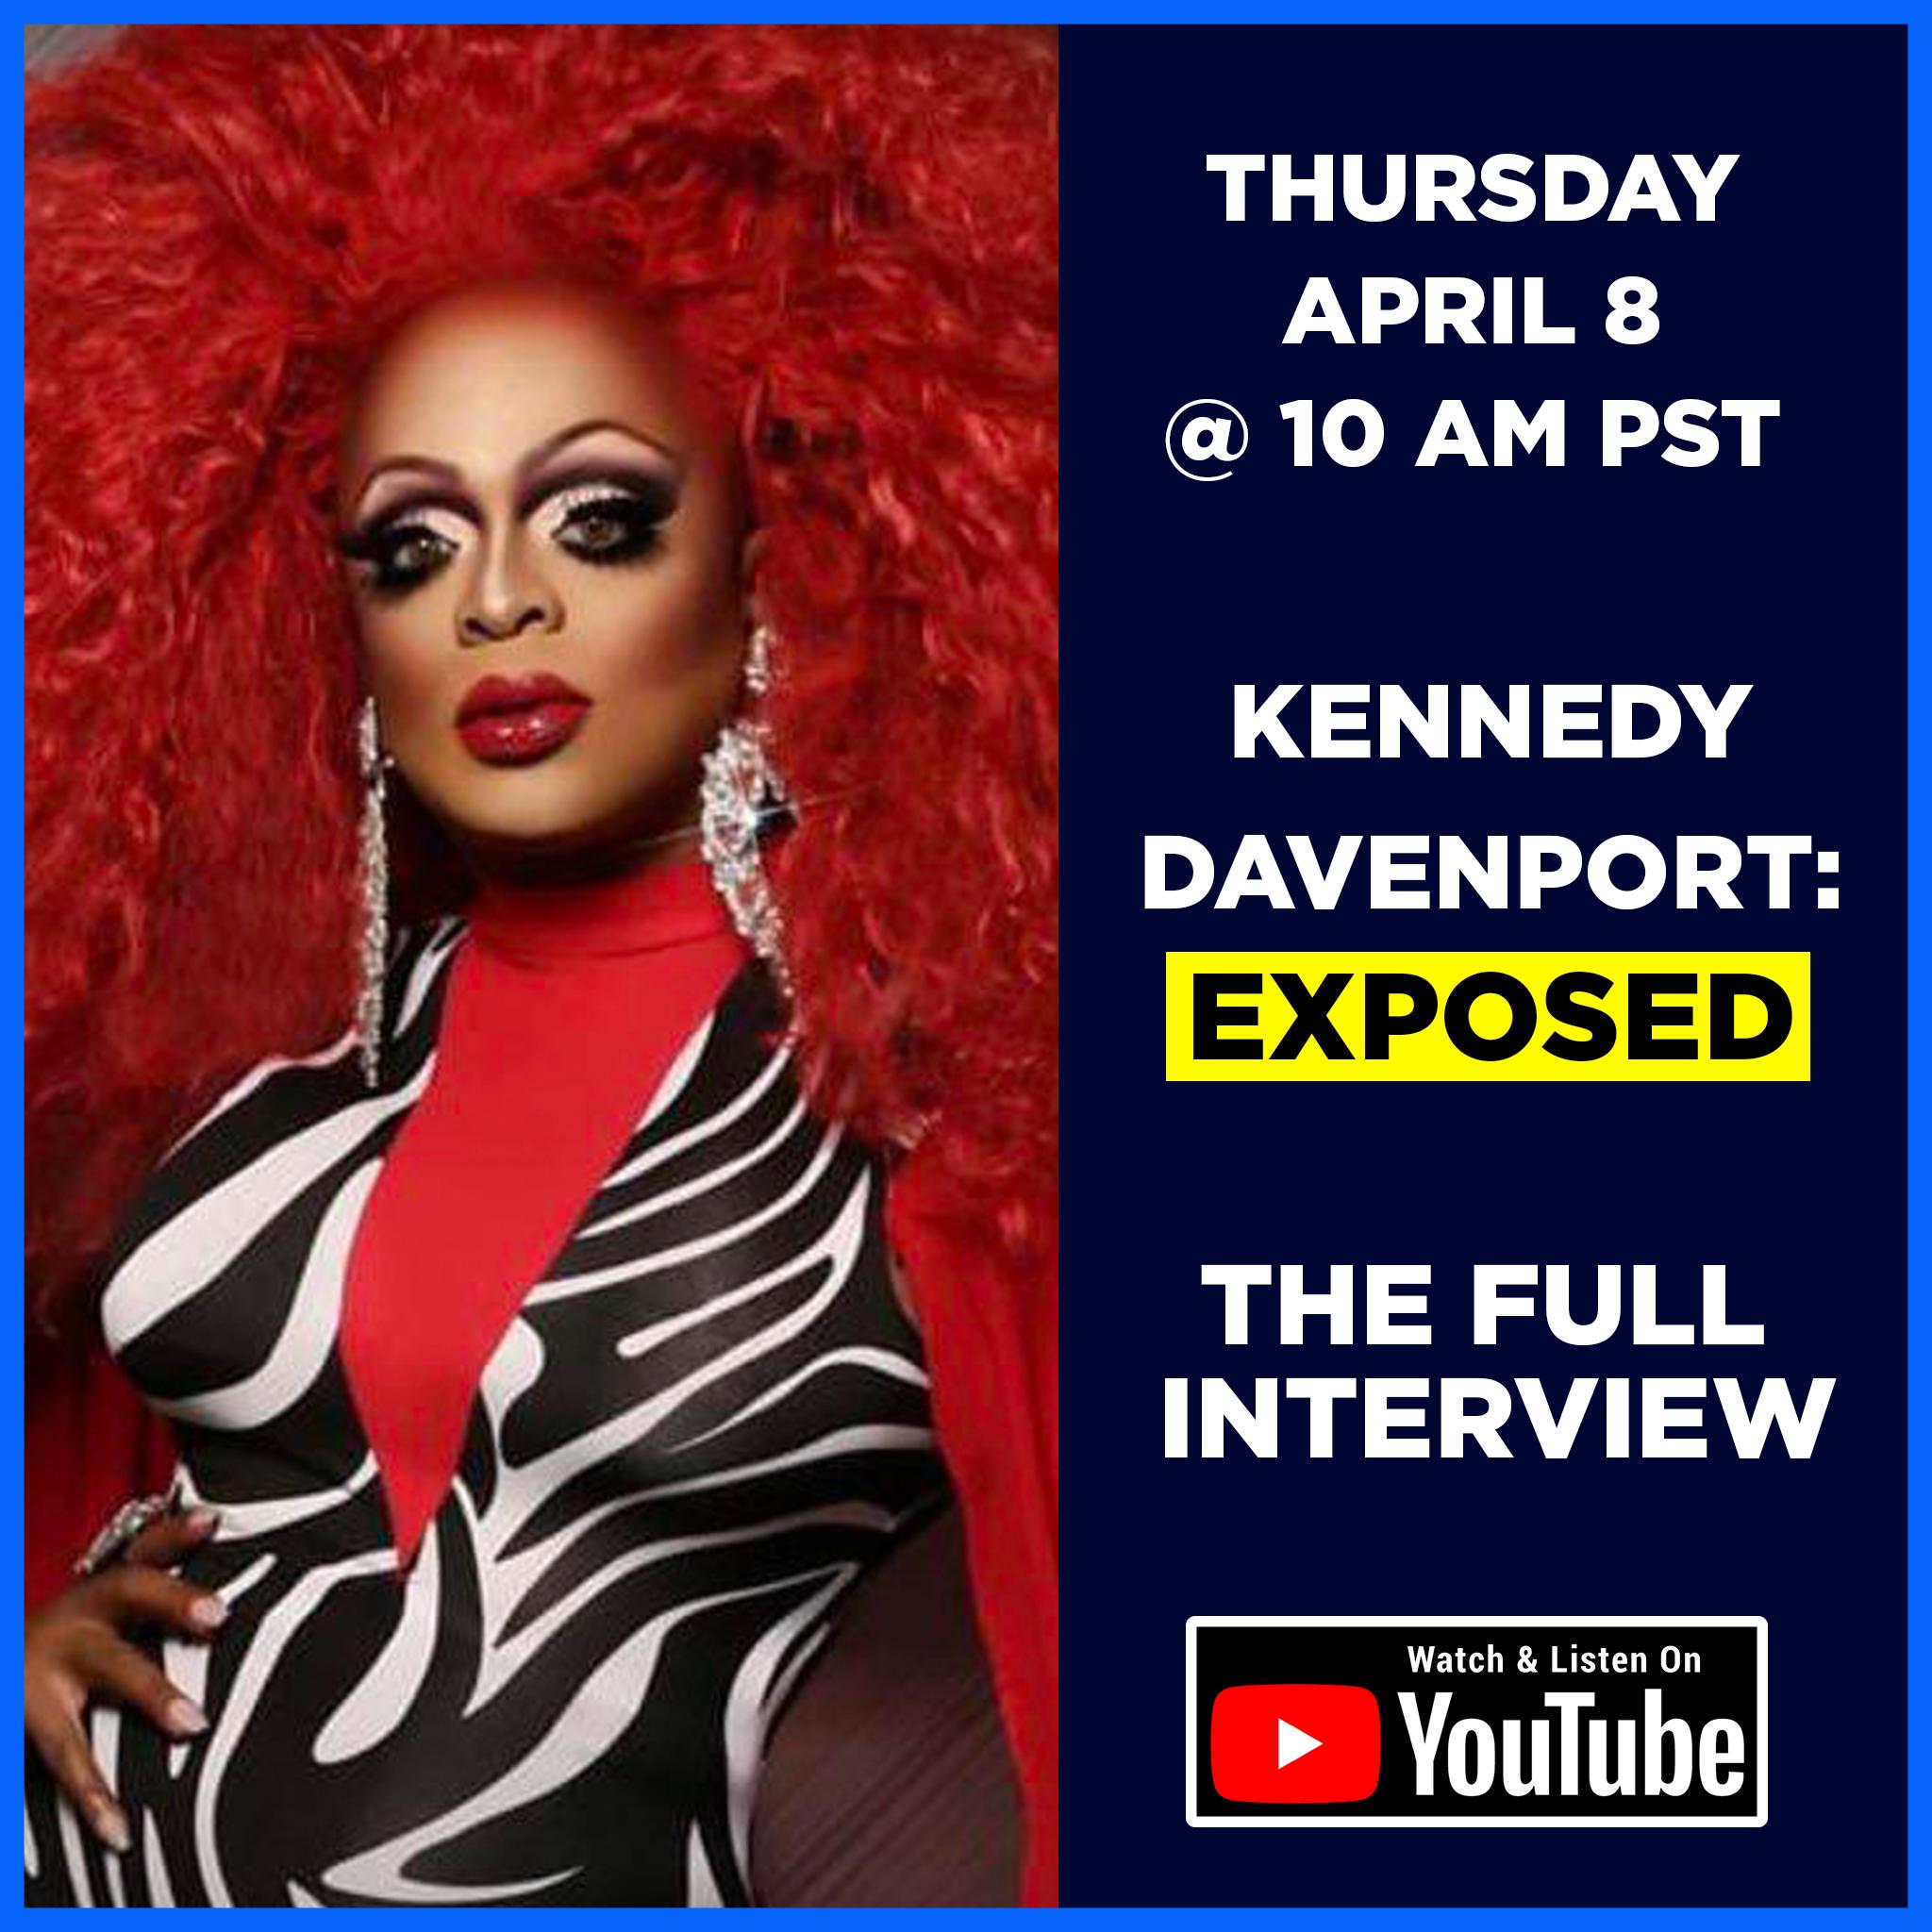 S3E6 - Kennedy Davenport: Exposed (The Full Interview)